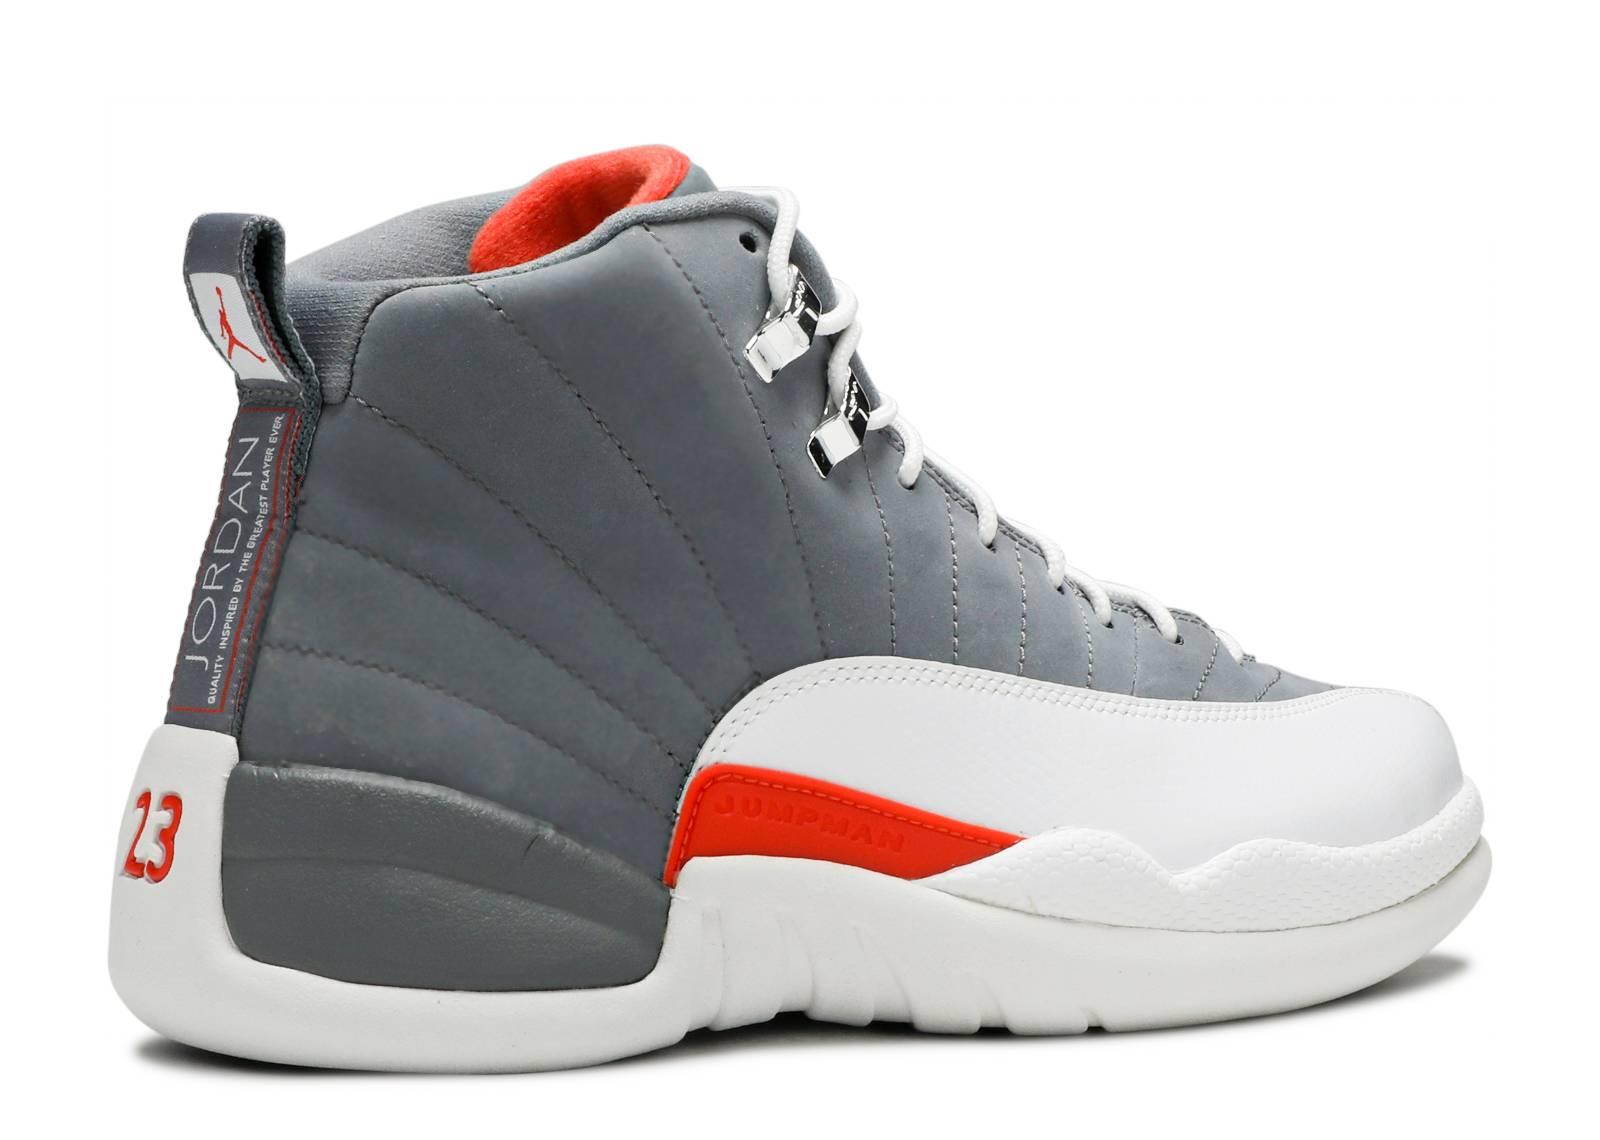 d9f597232666cf get cheap air jordan 12 retro cool grey white team orange for sale 4e096  01ec4  official store jordan 12s saleup to 65 discounts 40bd7 c280e